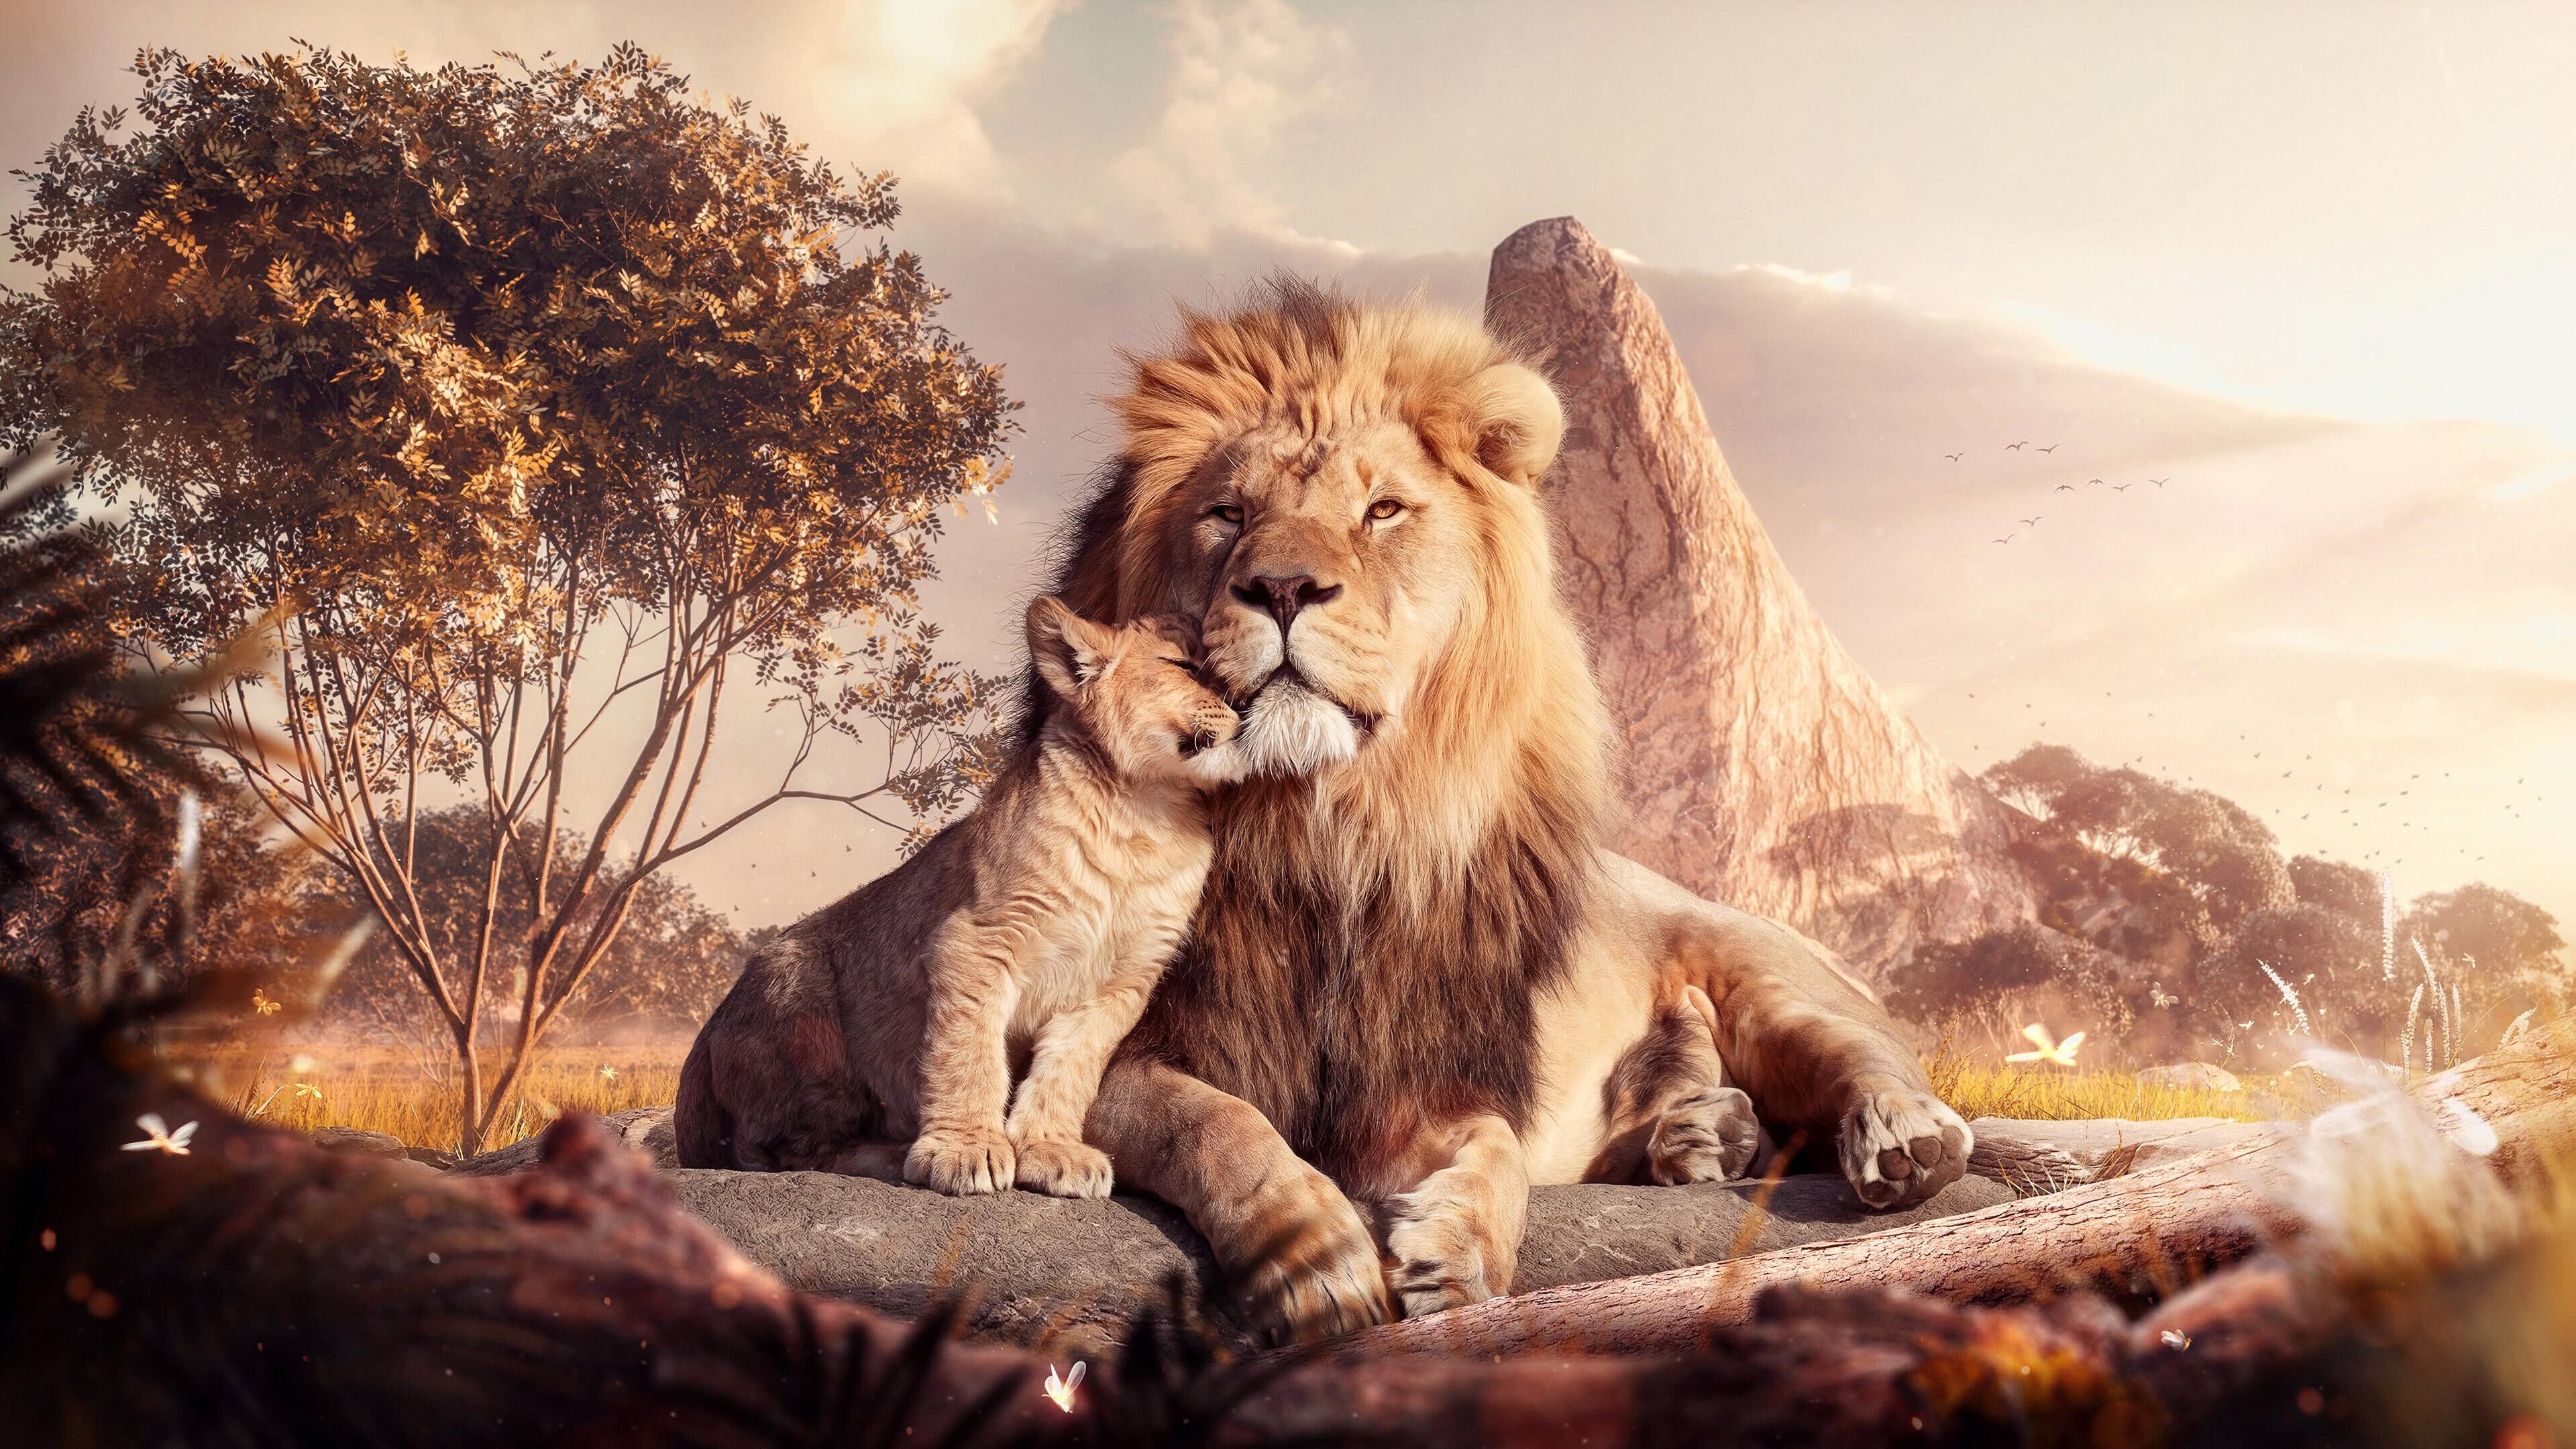 lion and cub uhd 4k wallpaper